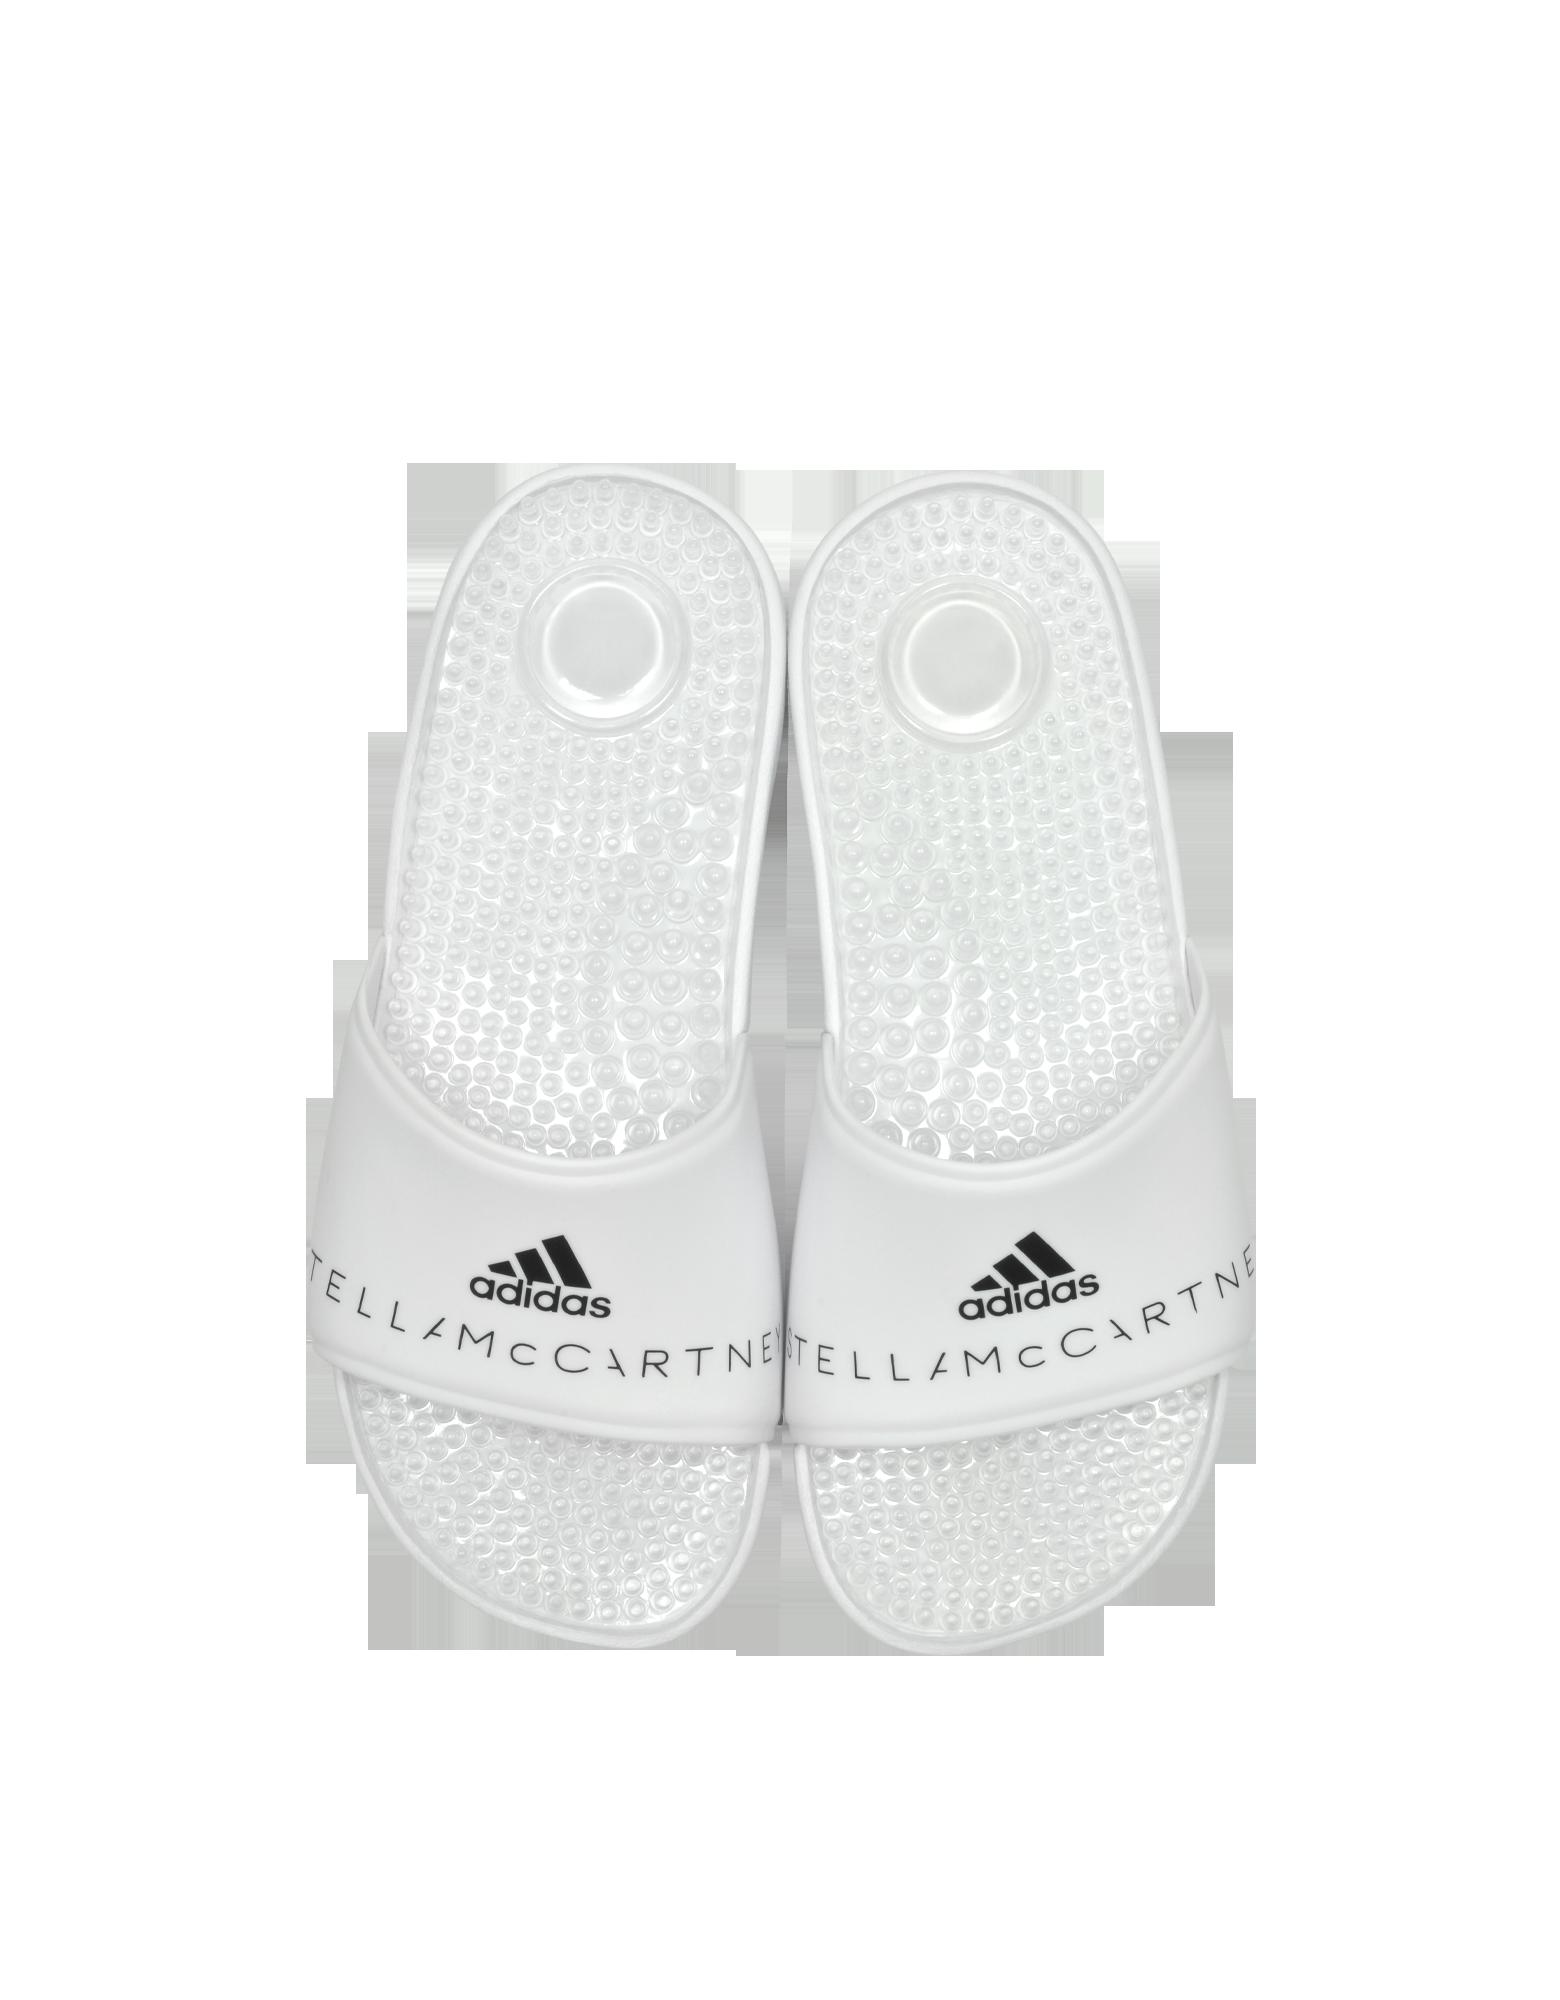 Image of Adissage White Slide Pool Sandals